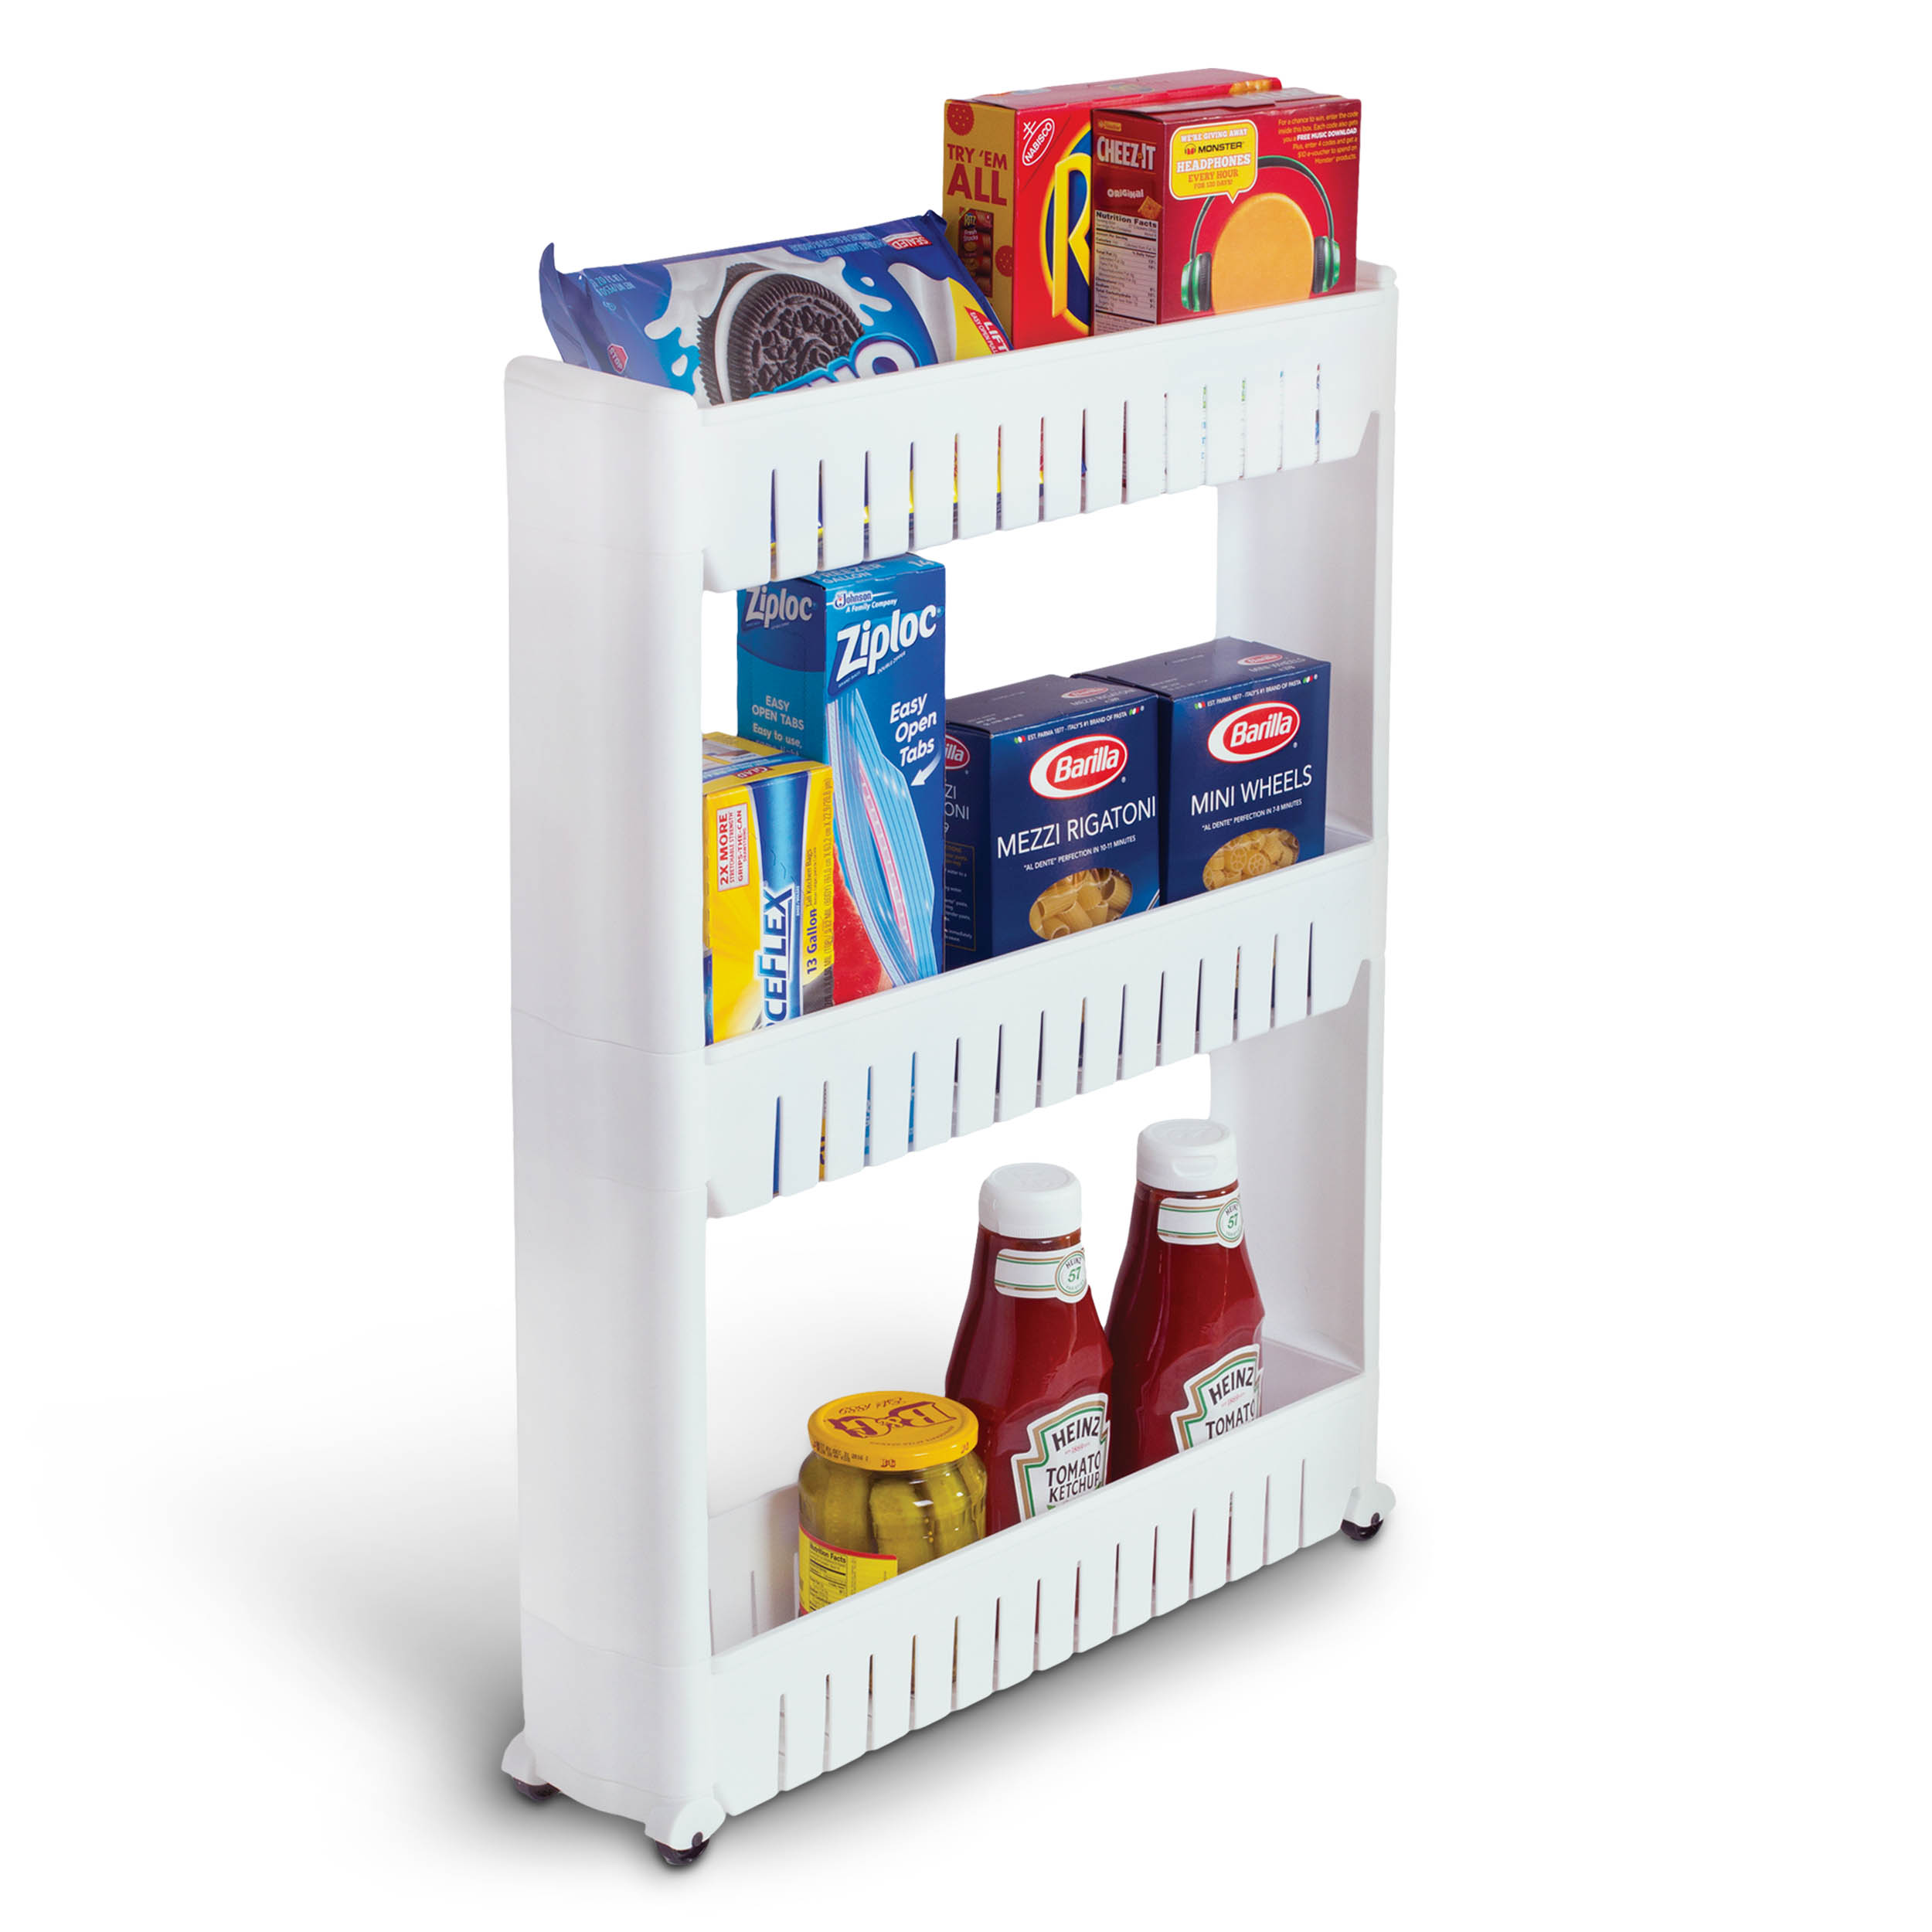 Laundry Room Organizer And Slim Storage Cart Mobile